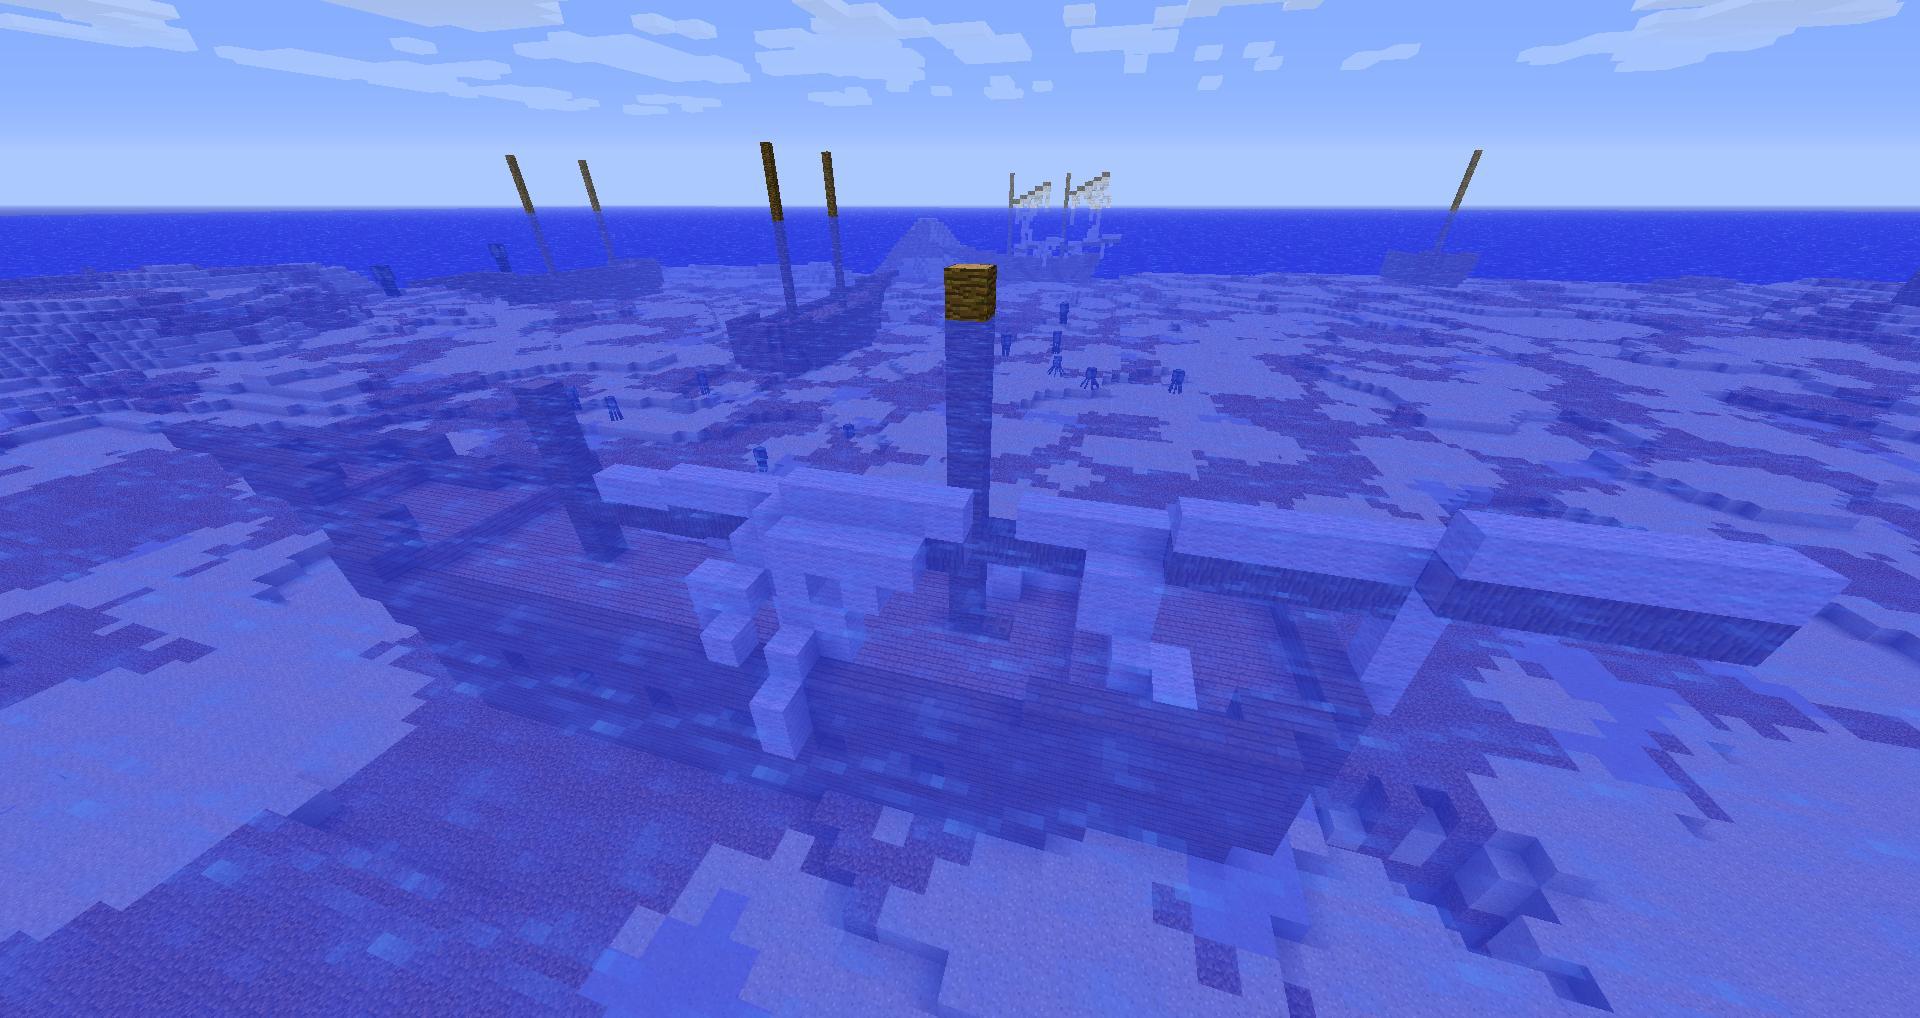 temple run minecraft map